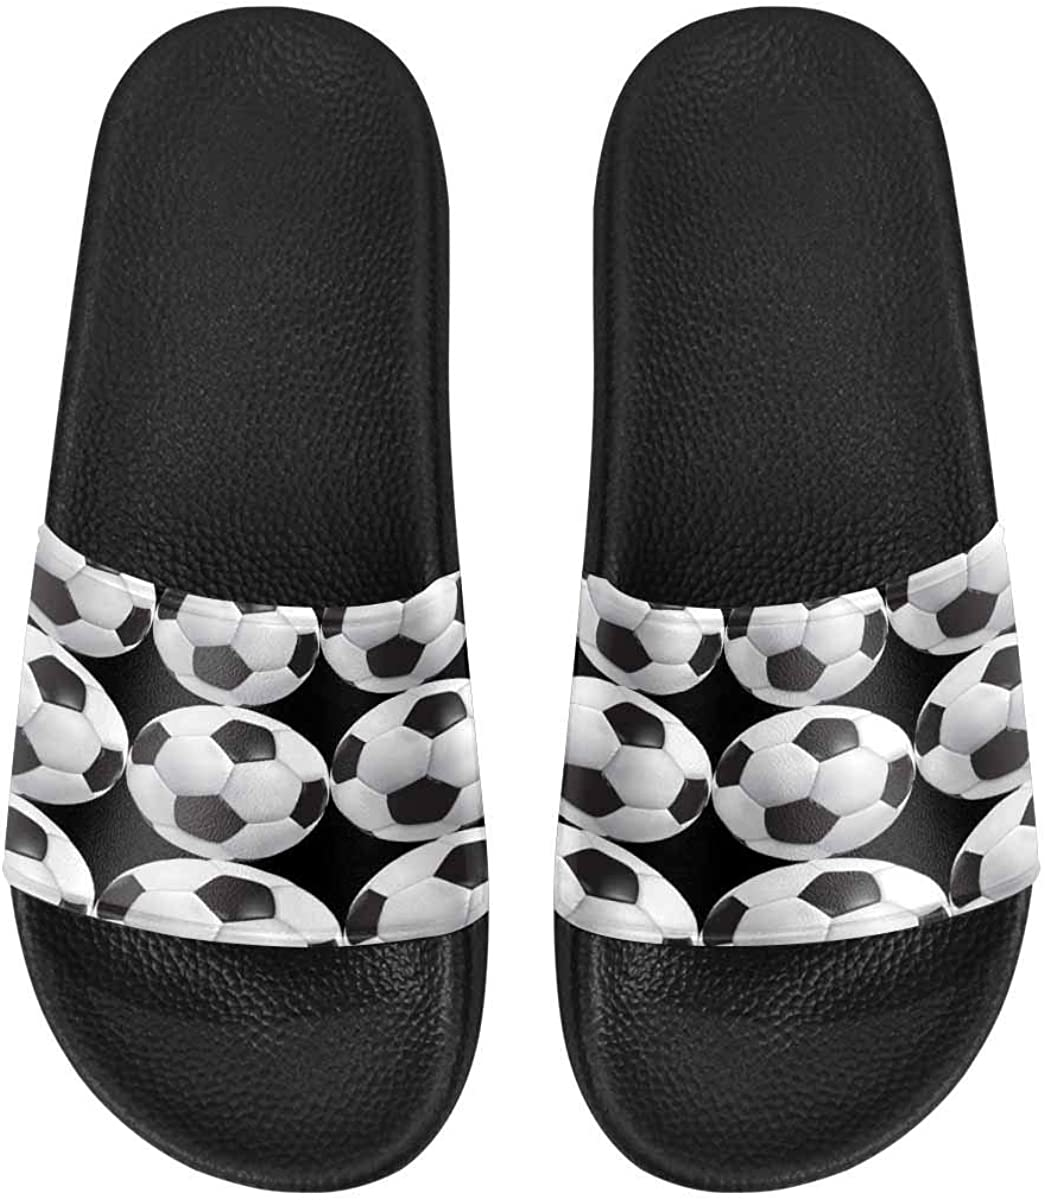 InterestPrint Women's Indoor Summer Slide Sandals Soccer Ball in Fire and Water